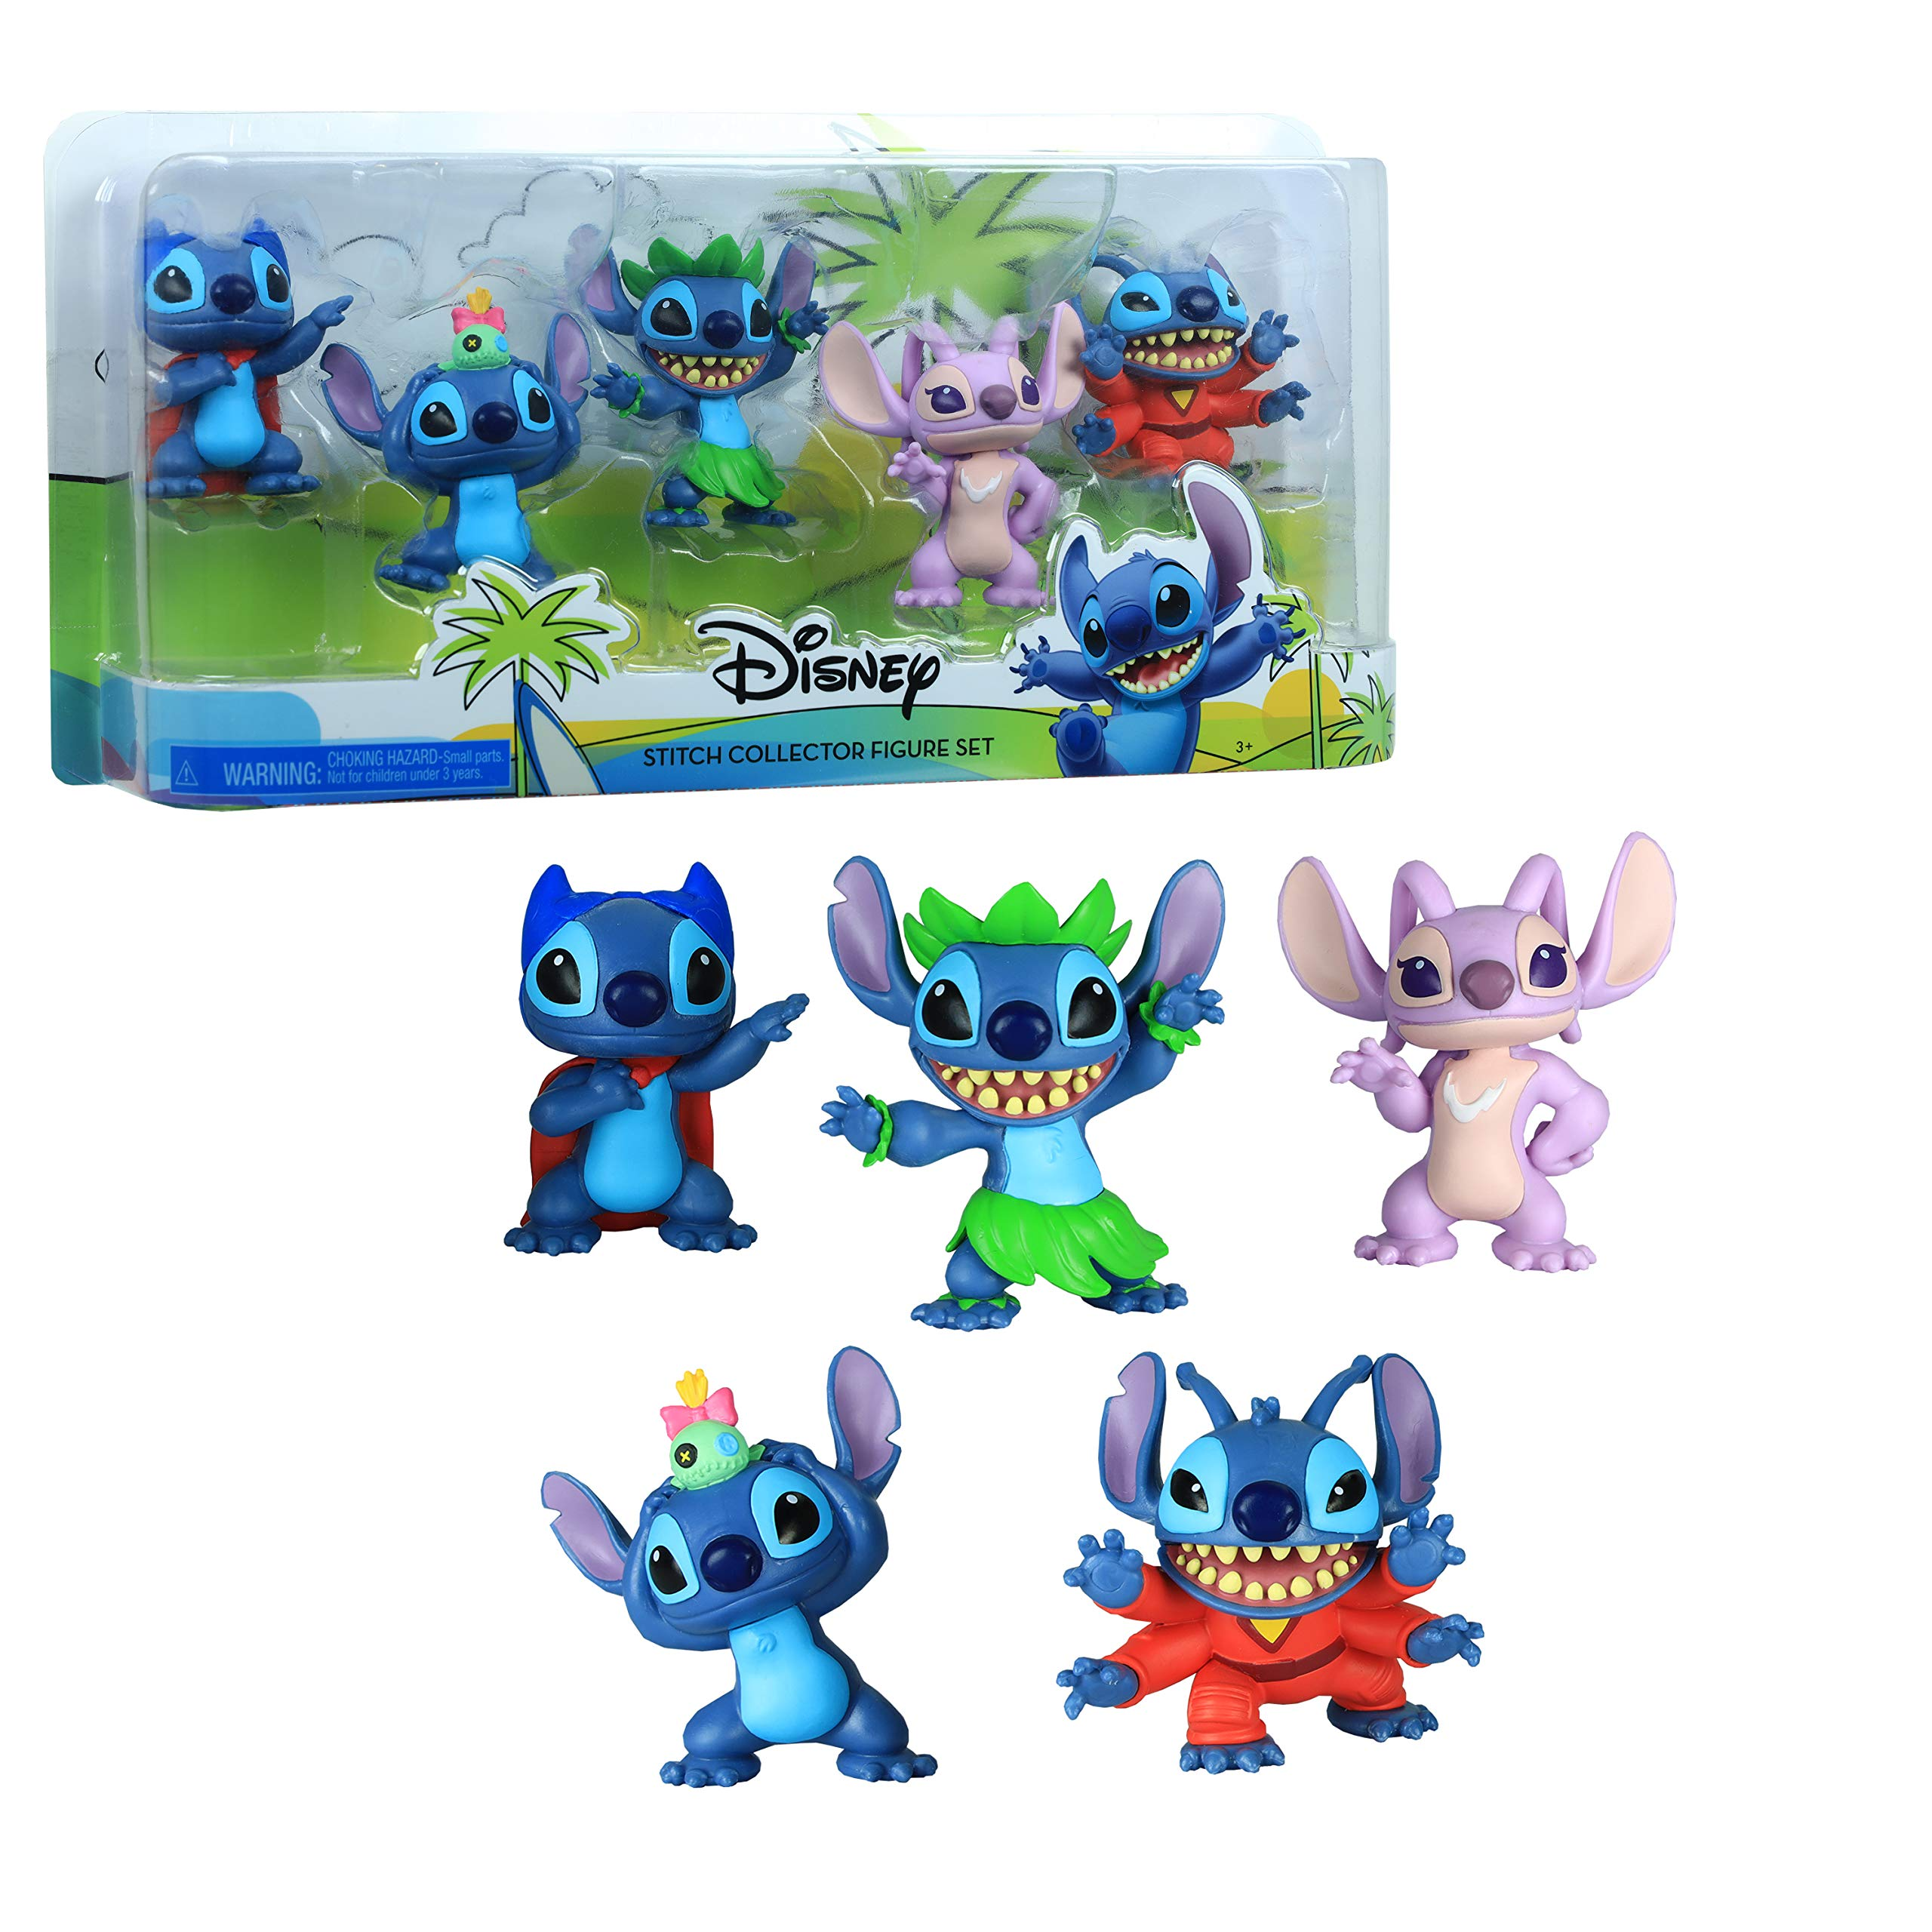 Disney Lilo & Stitch Collectible Stitch Figure Set, 5-Pieces, Multi-Color (46211)